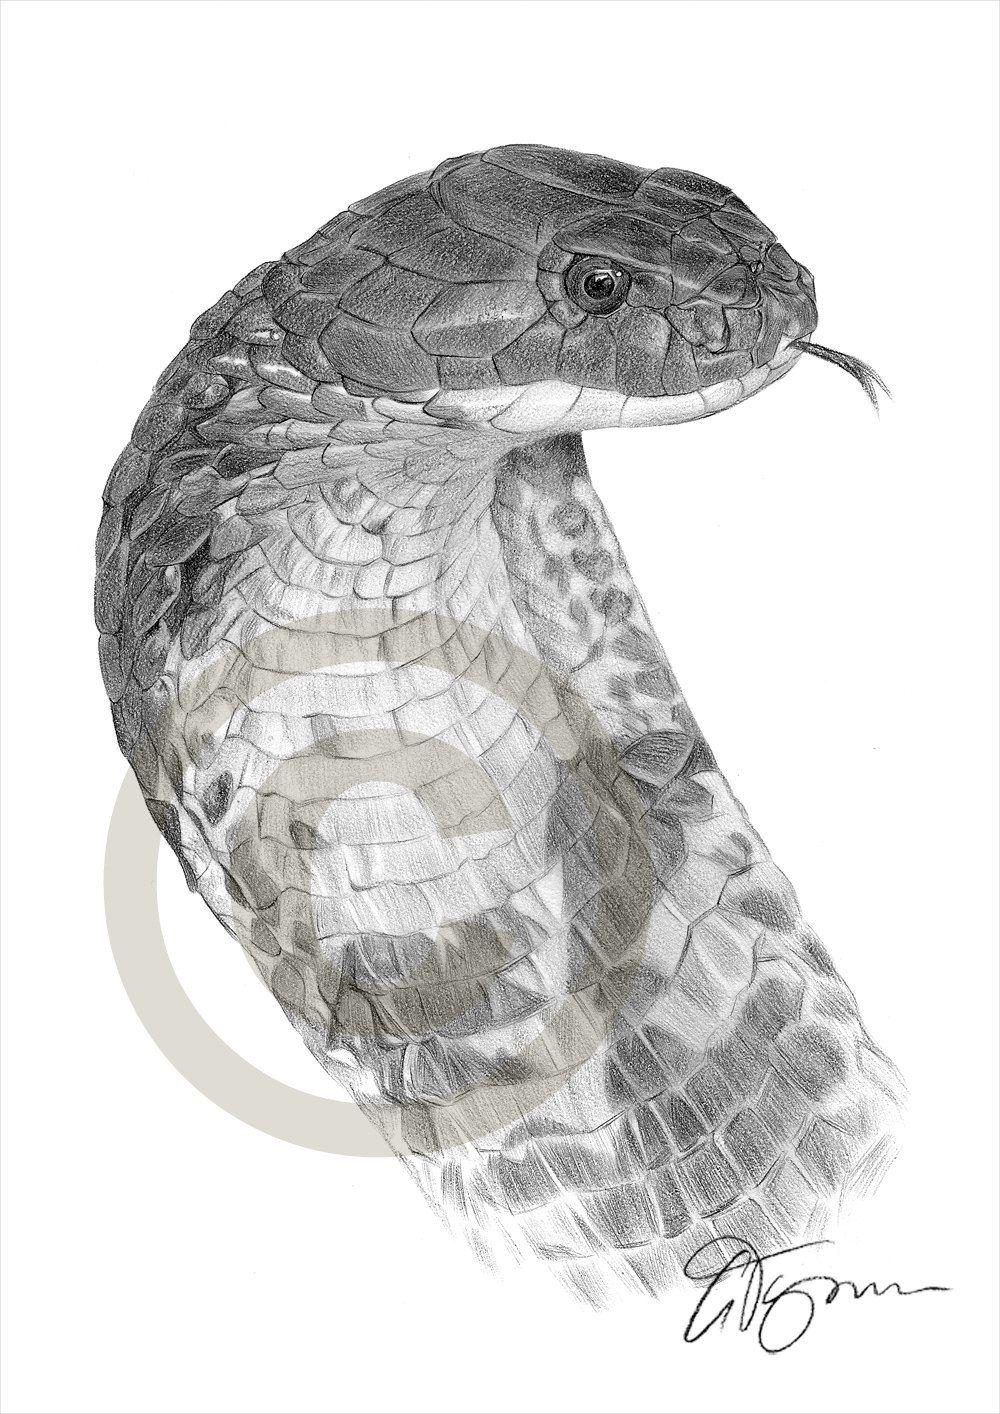 Snake king cobra pencil drawing print a4 size artwork